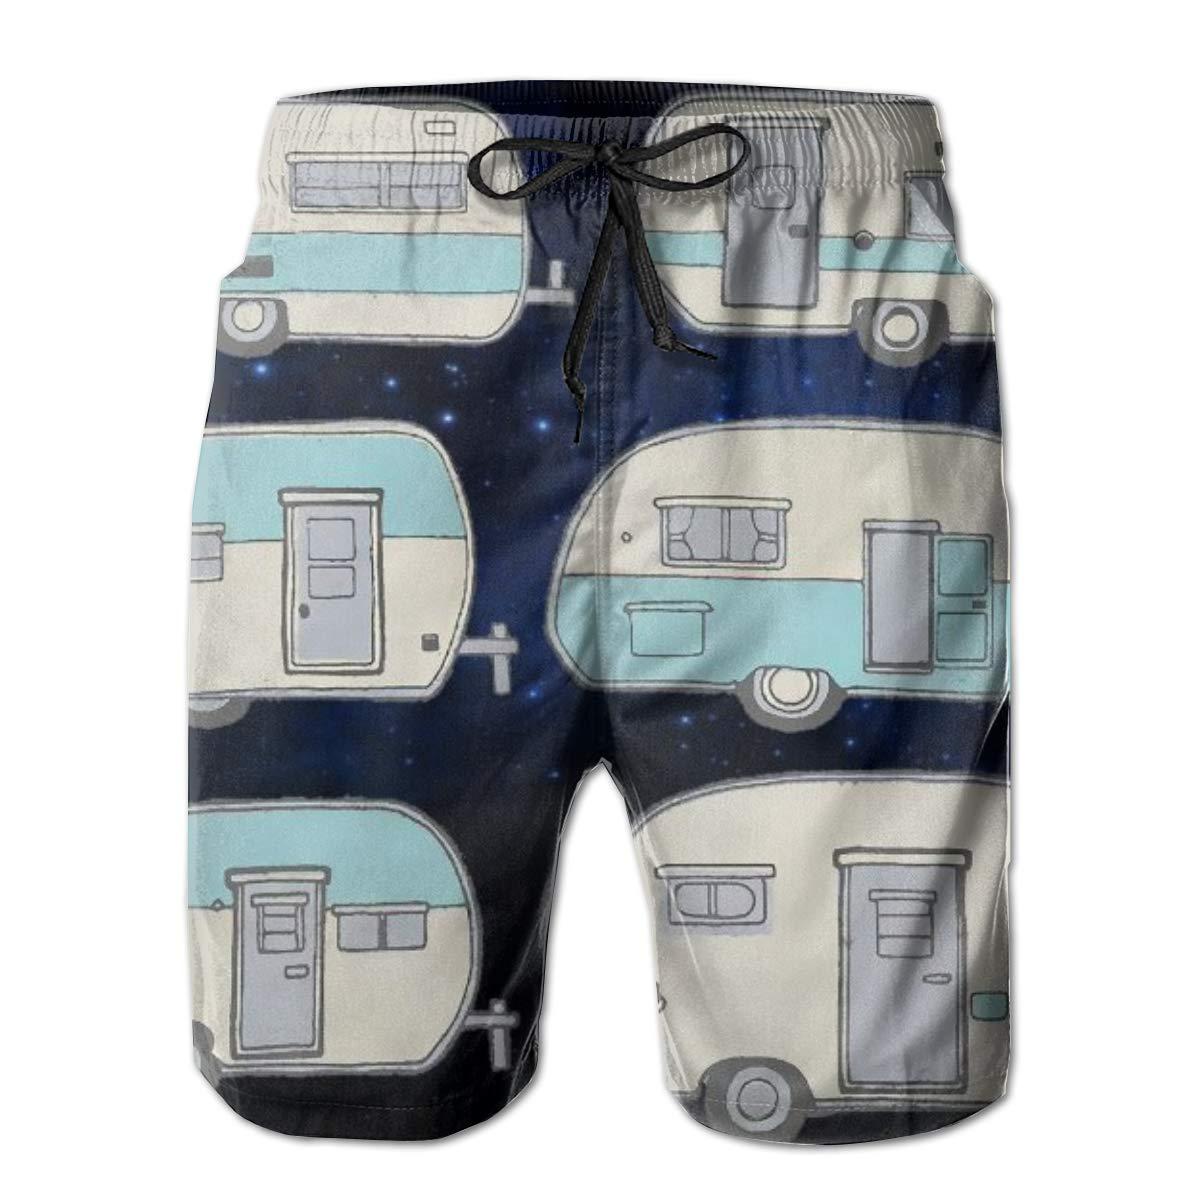 Father Swim Trunks Camper Doodles RV Van Beach Wear Board Running Shorts Swim Pants Quick Dry